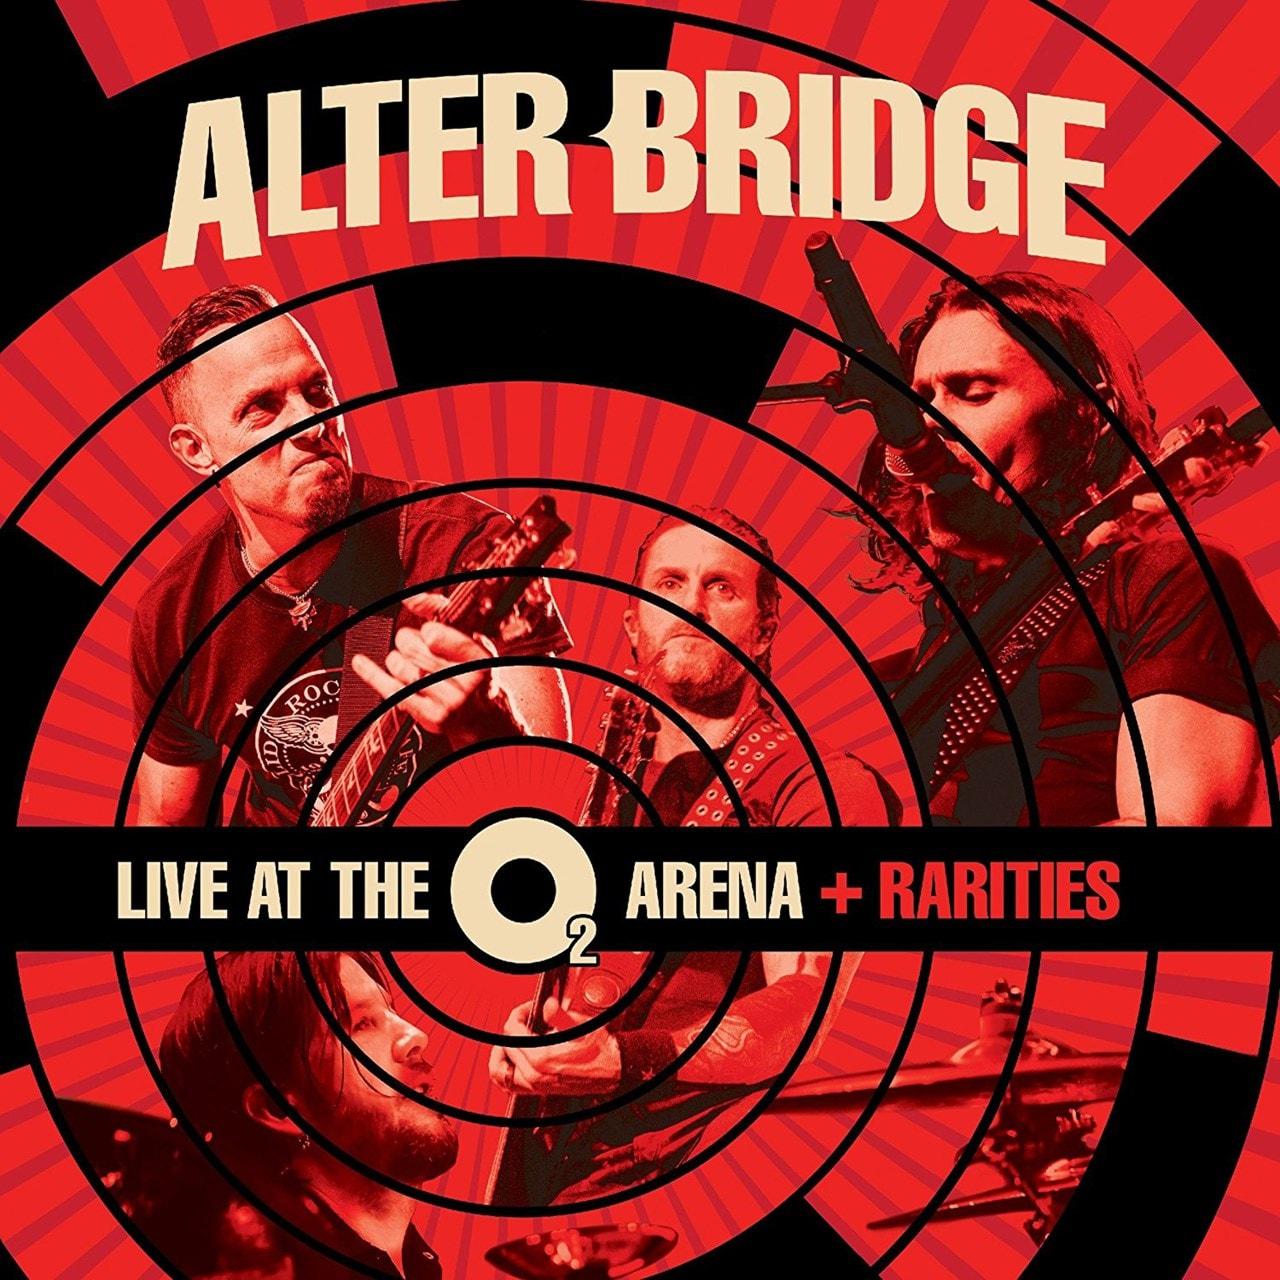 Live at the O2 Arena + Rarities - 1